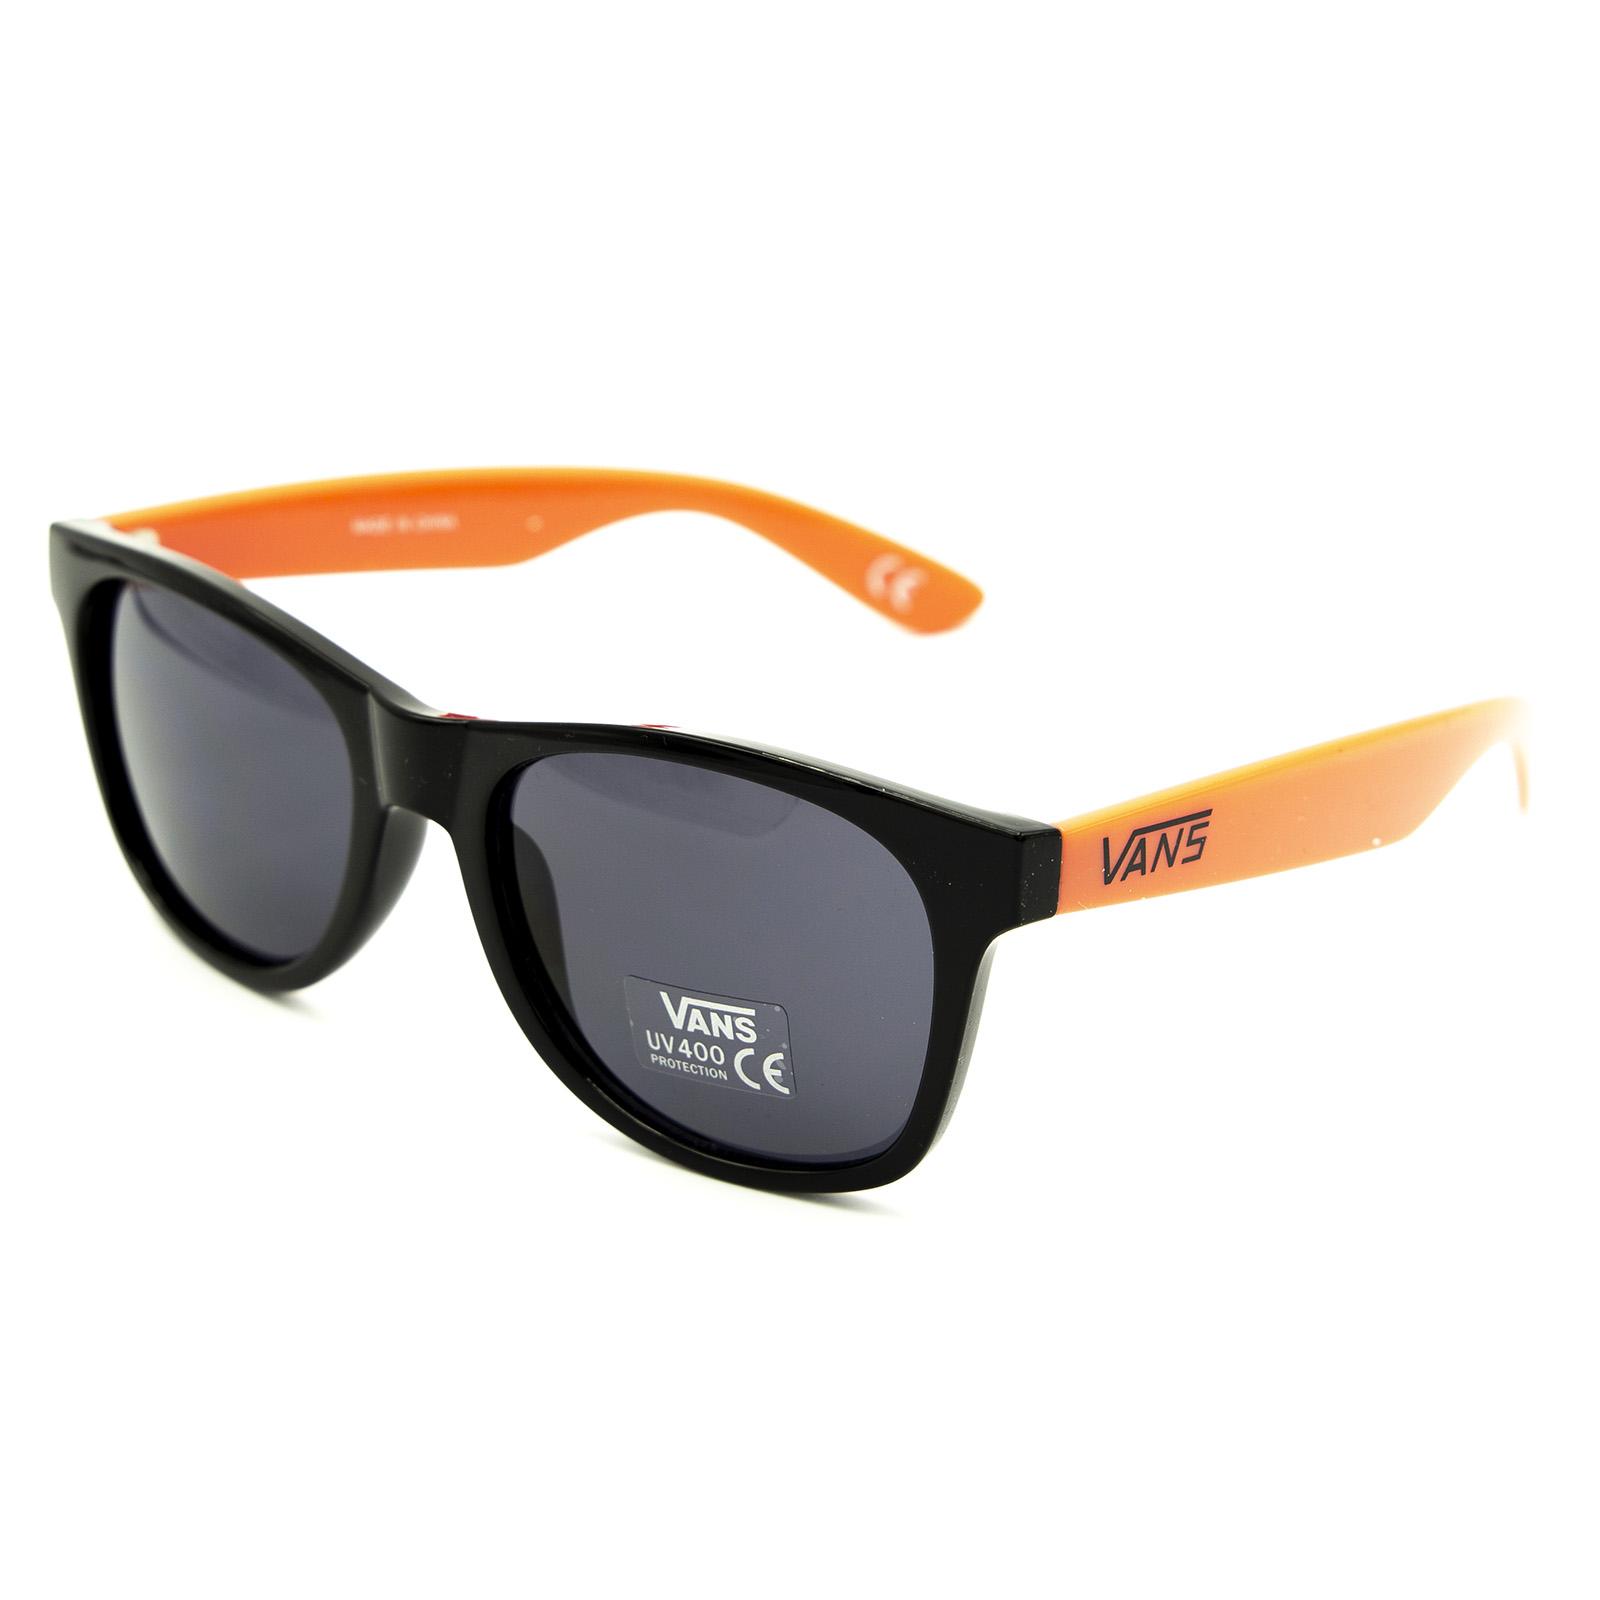 occhiali vans da sole uomo